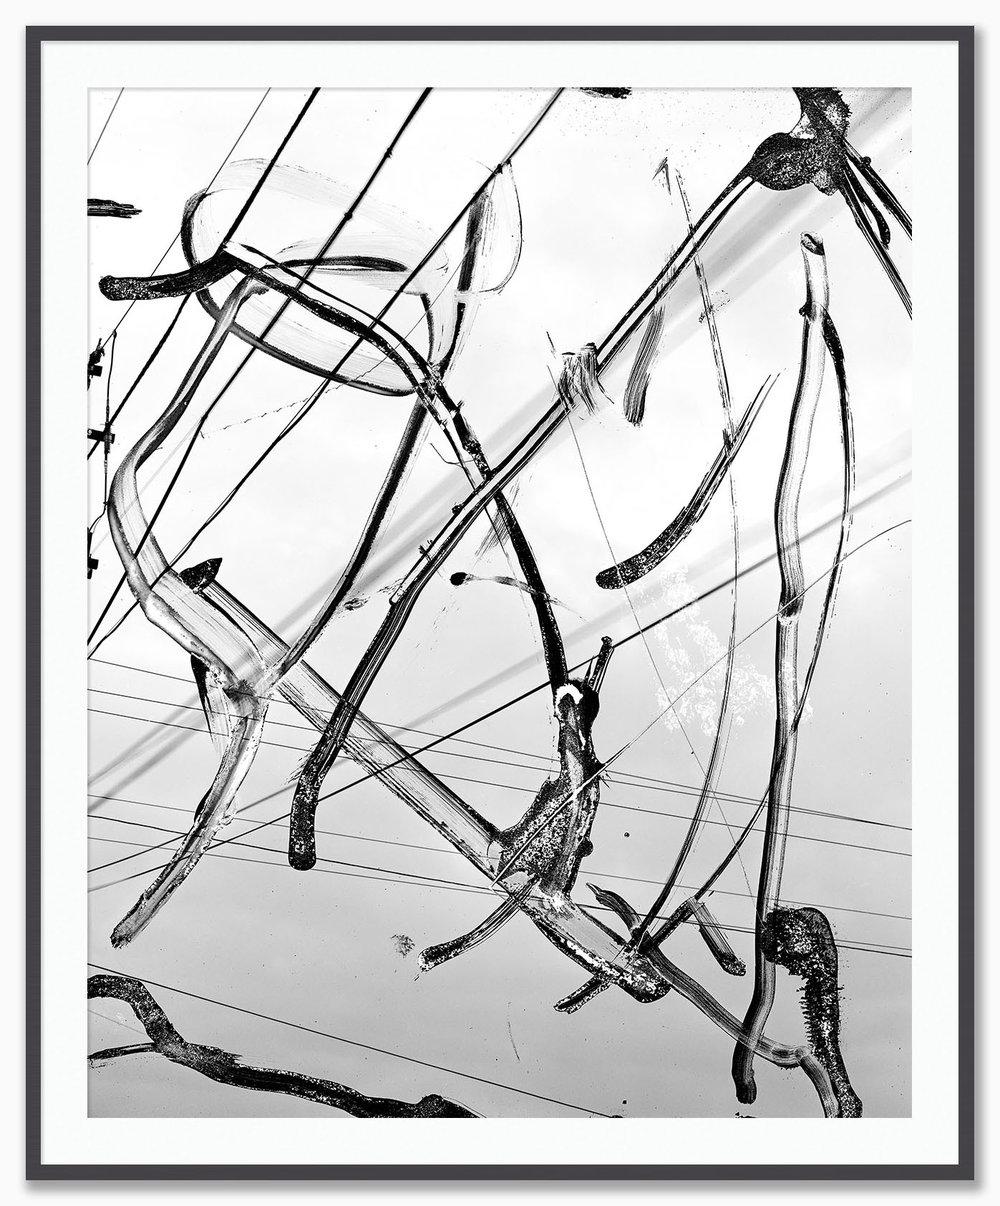 Wires_Mat_Dusk.jpg